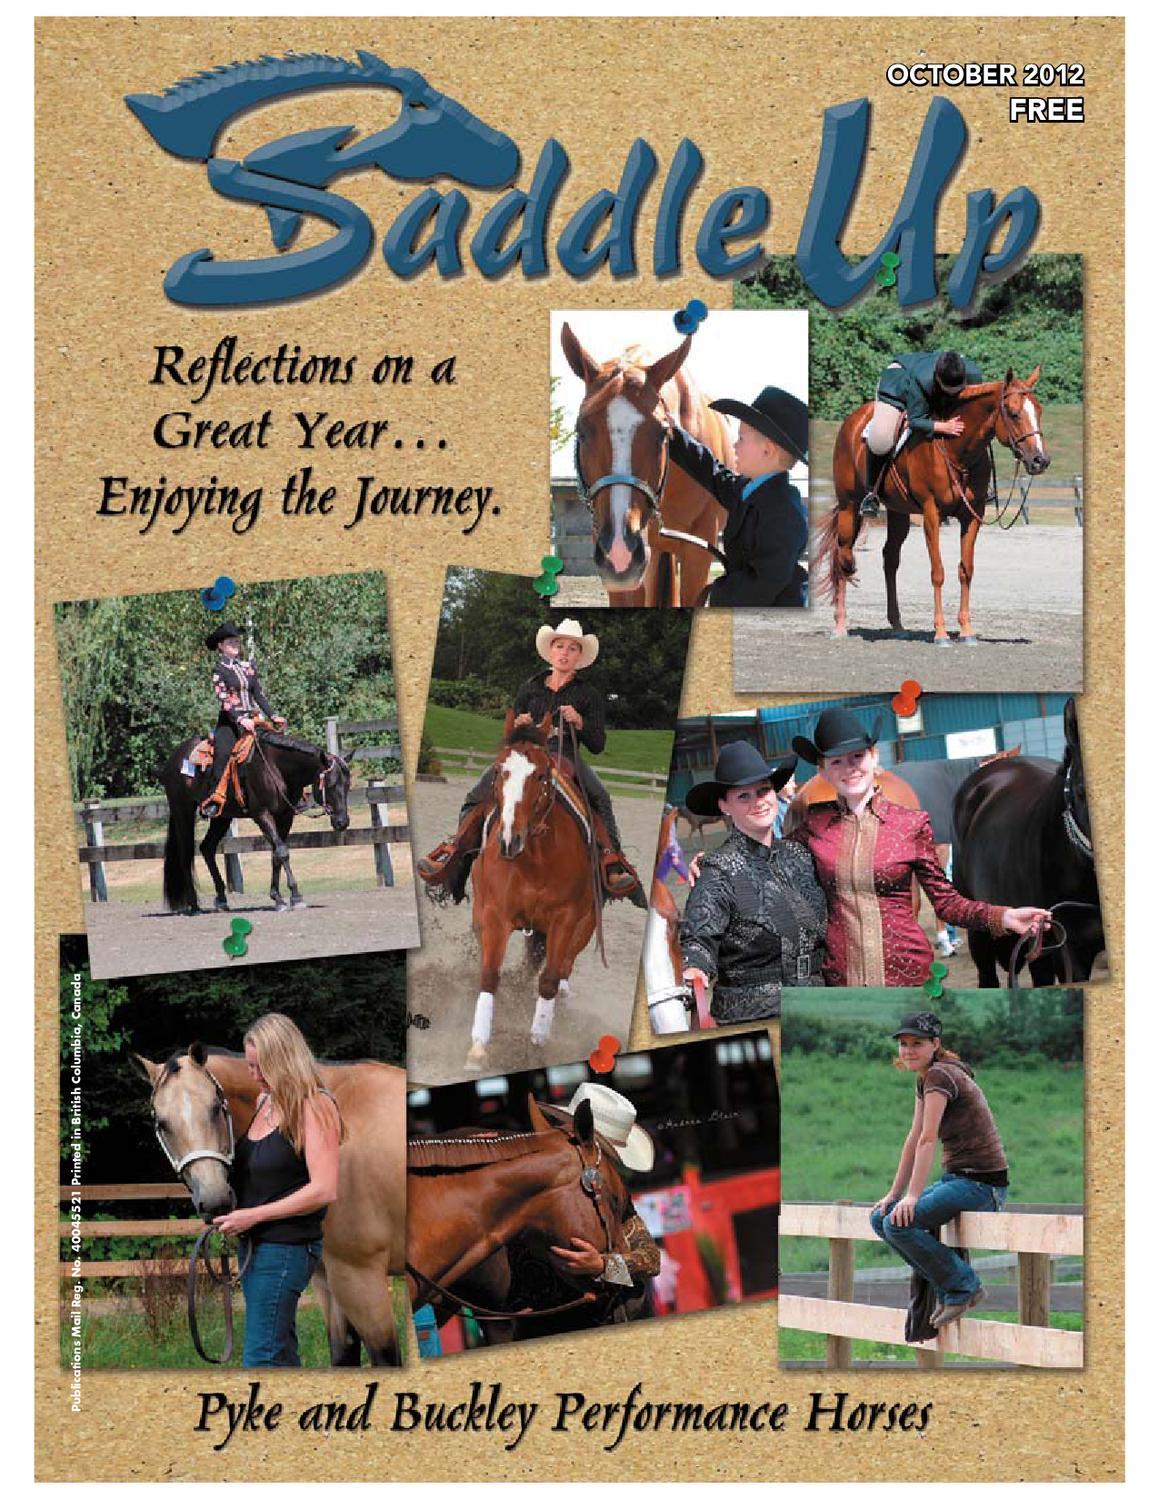 Horka Equestrian Nylon Durable Comfort Soft Marathon Horse Riding Spurs Strap